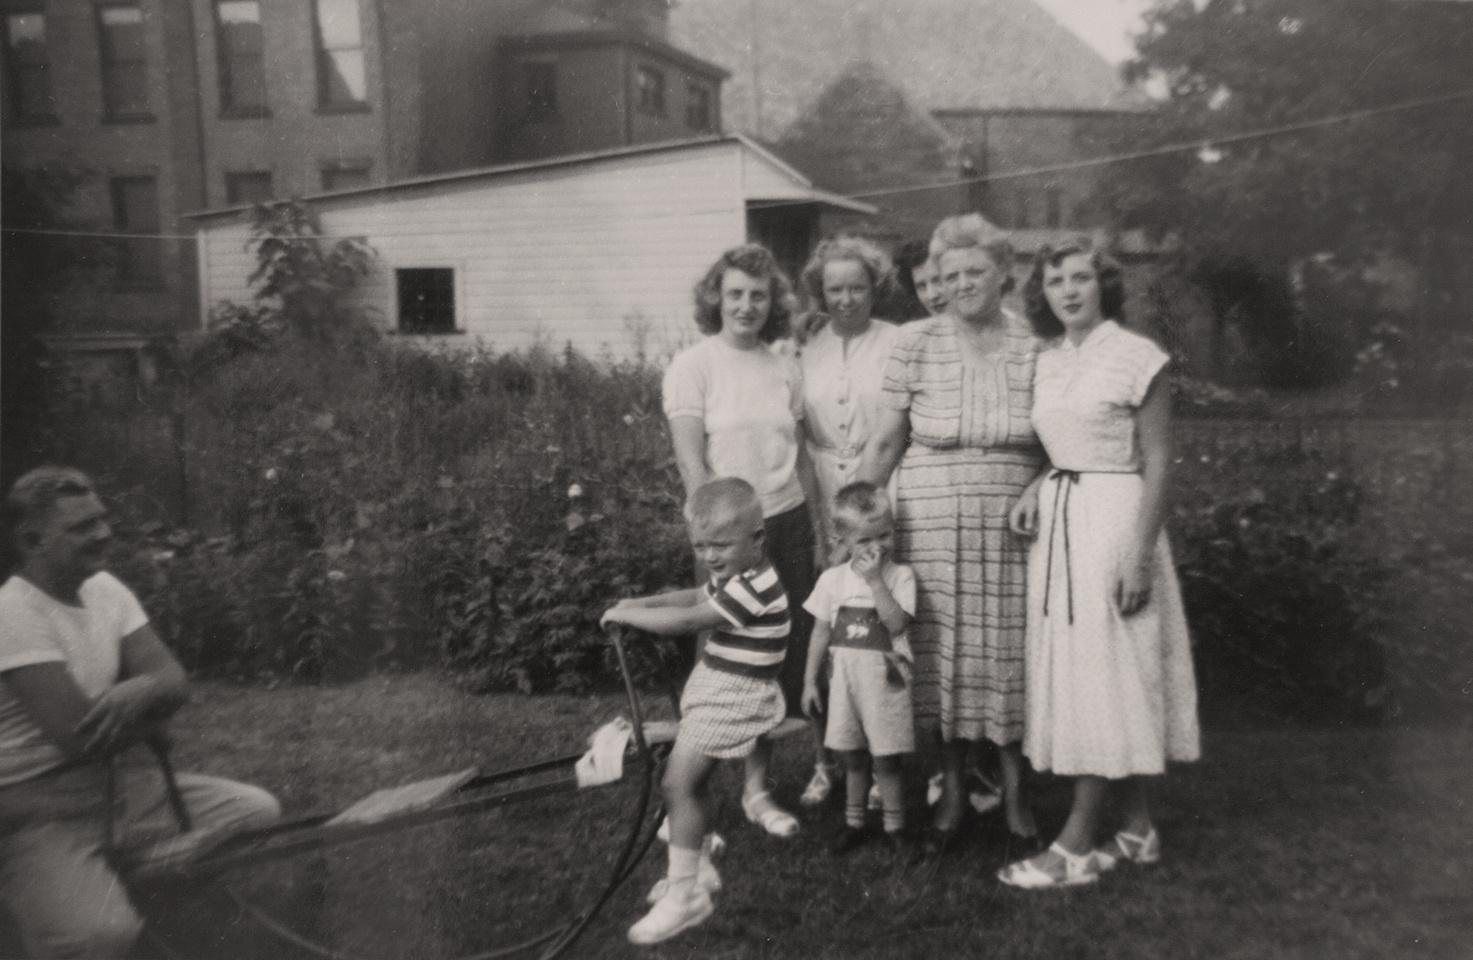 Michelle M. Murosky: The Murosky Collection &emdash; 1950's - Murosky Family Gathering